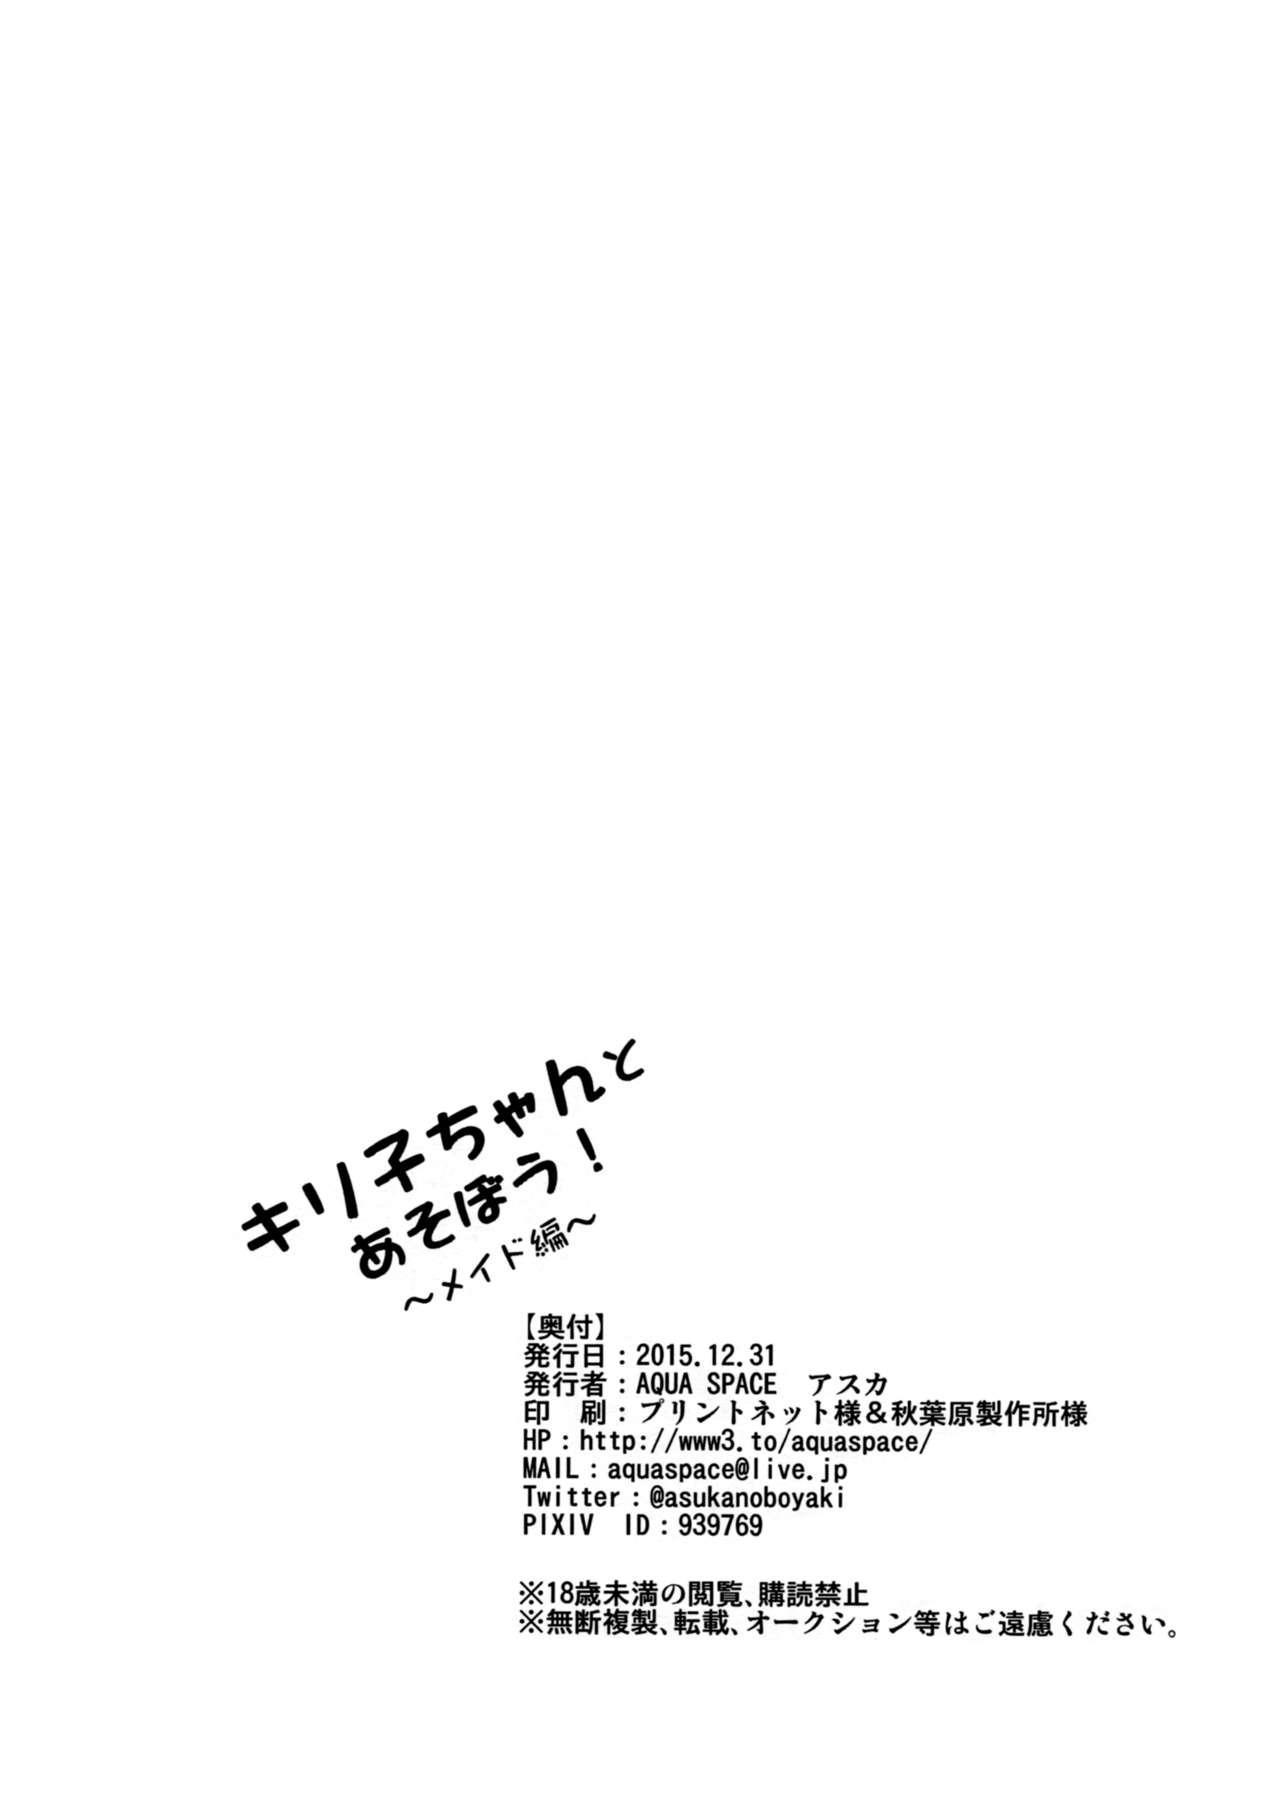 (C89) [AQUA SPACE (Asuka)] Kiriko-chan to Asobou! ~Maid Hen~   Let's play with Kiriko-chan! ~Maid version!~ (Sword Art Online) [English] [EHCOVE] 16